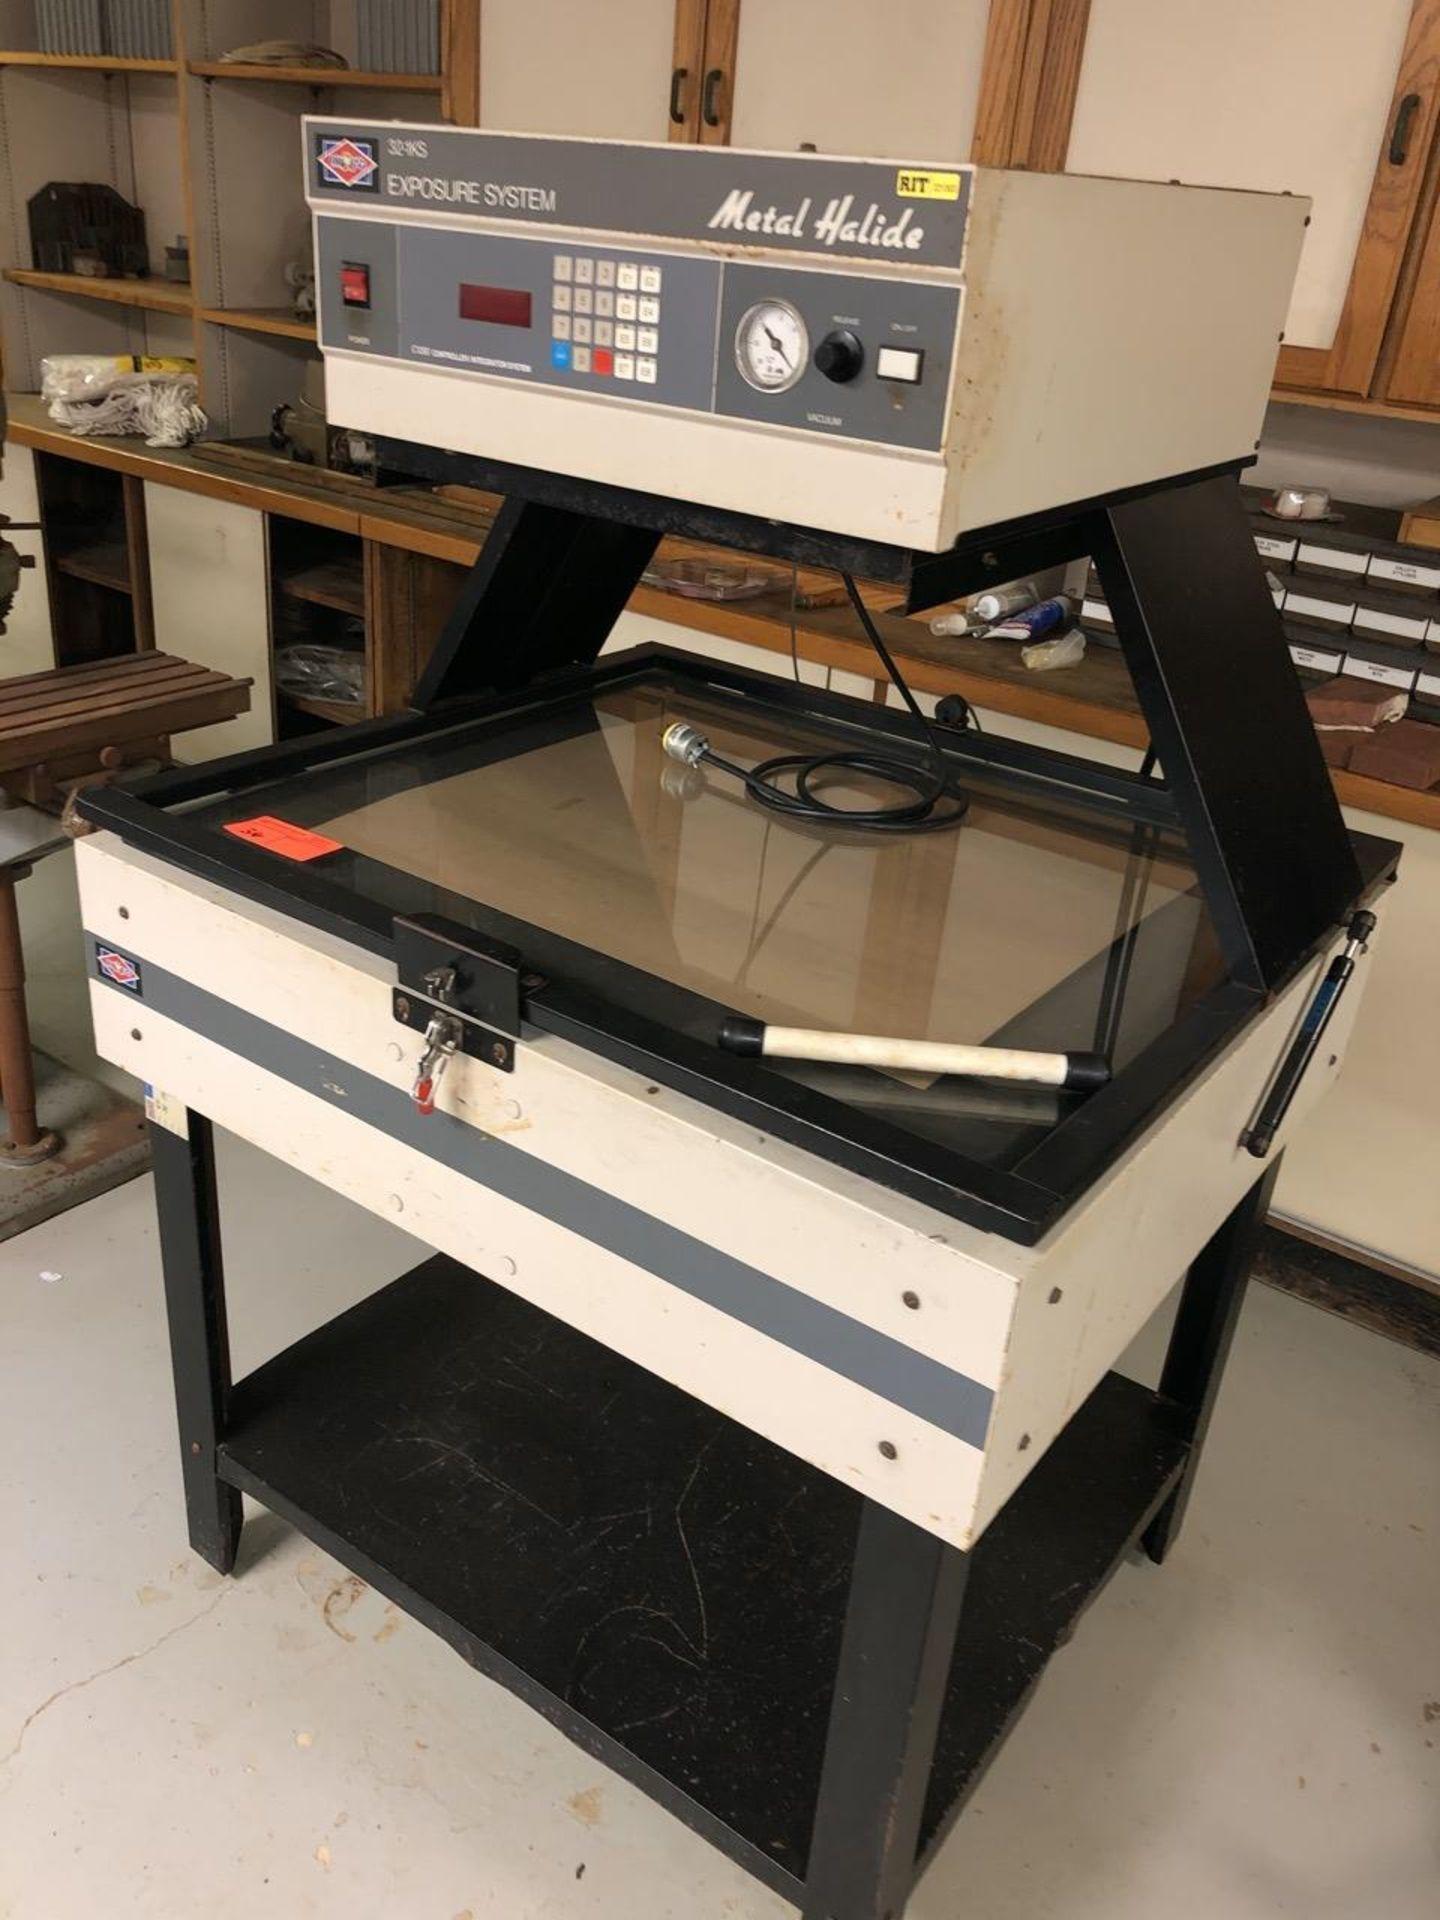 Lot 32 - Naurc 32-1 KS Metal Screen Engraving Exposure System